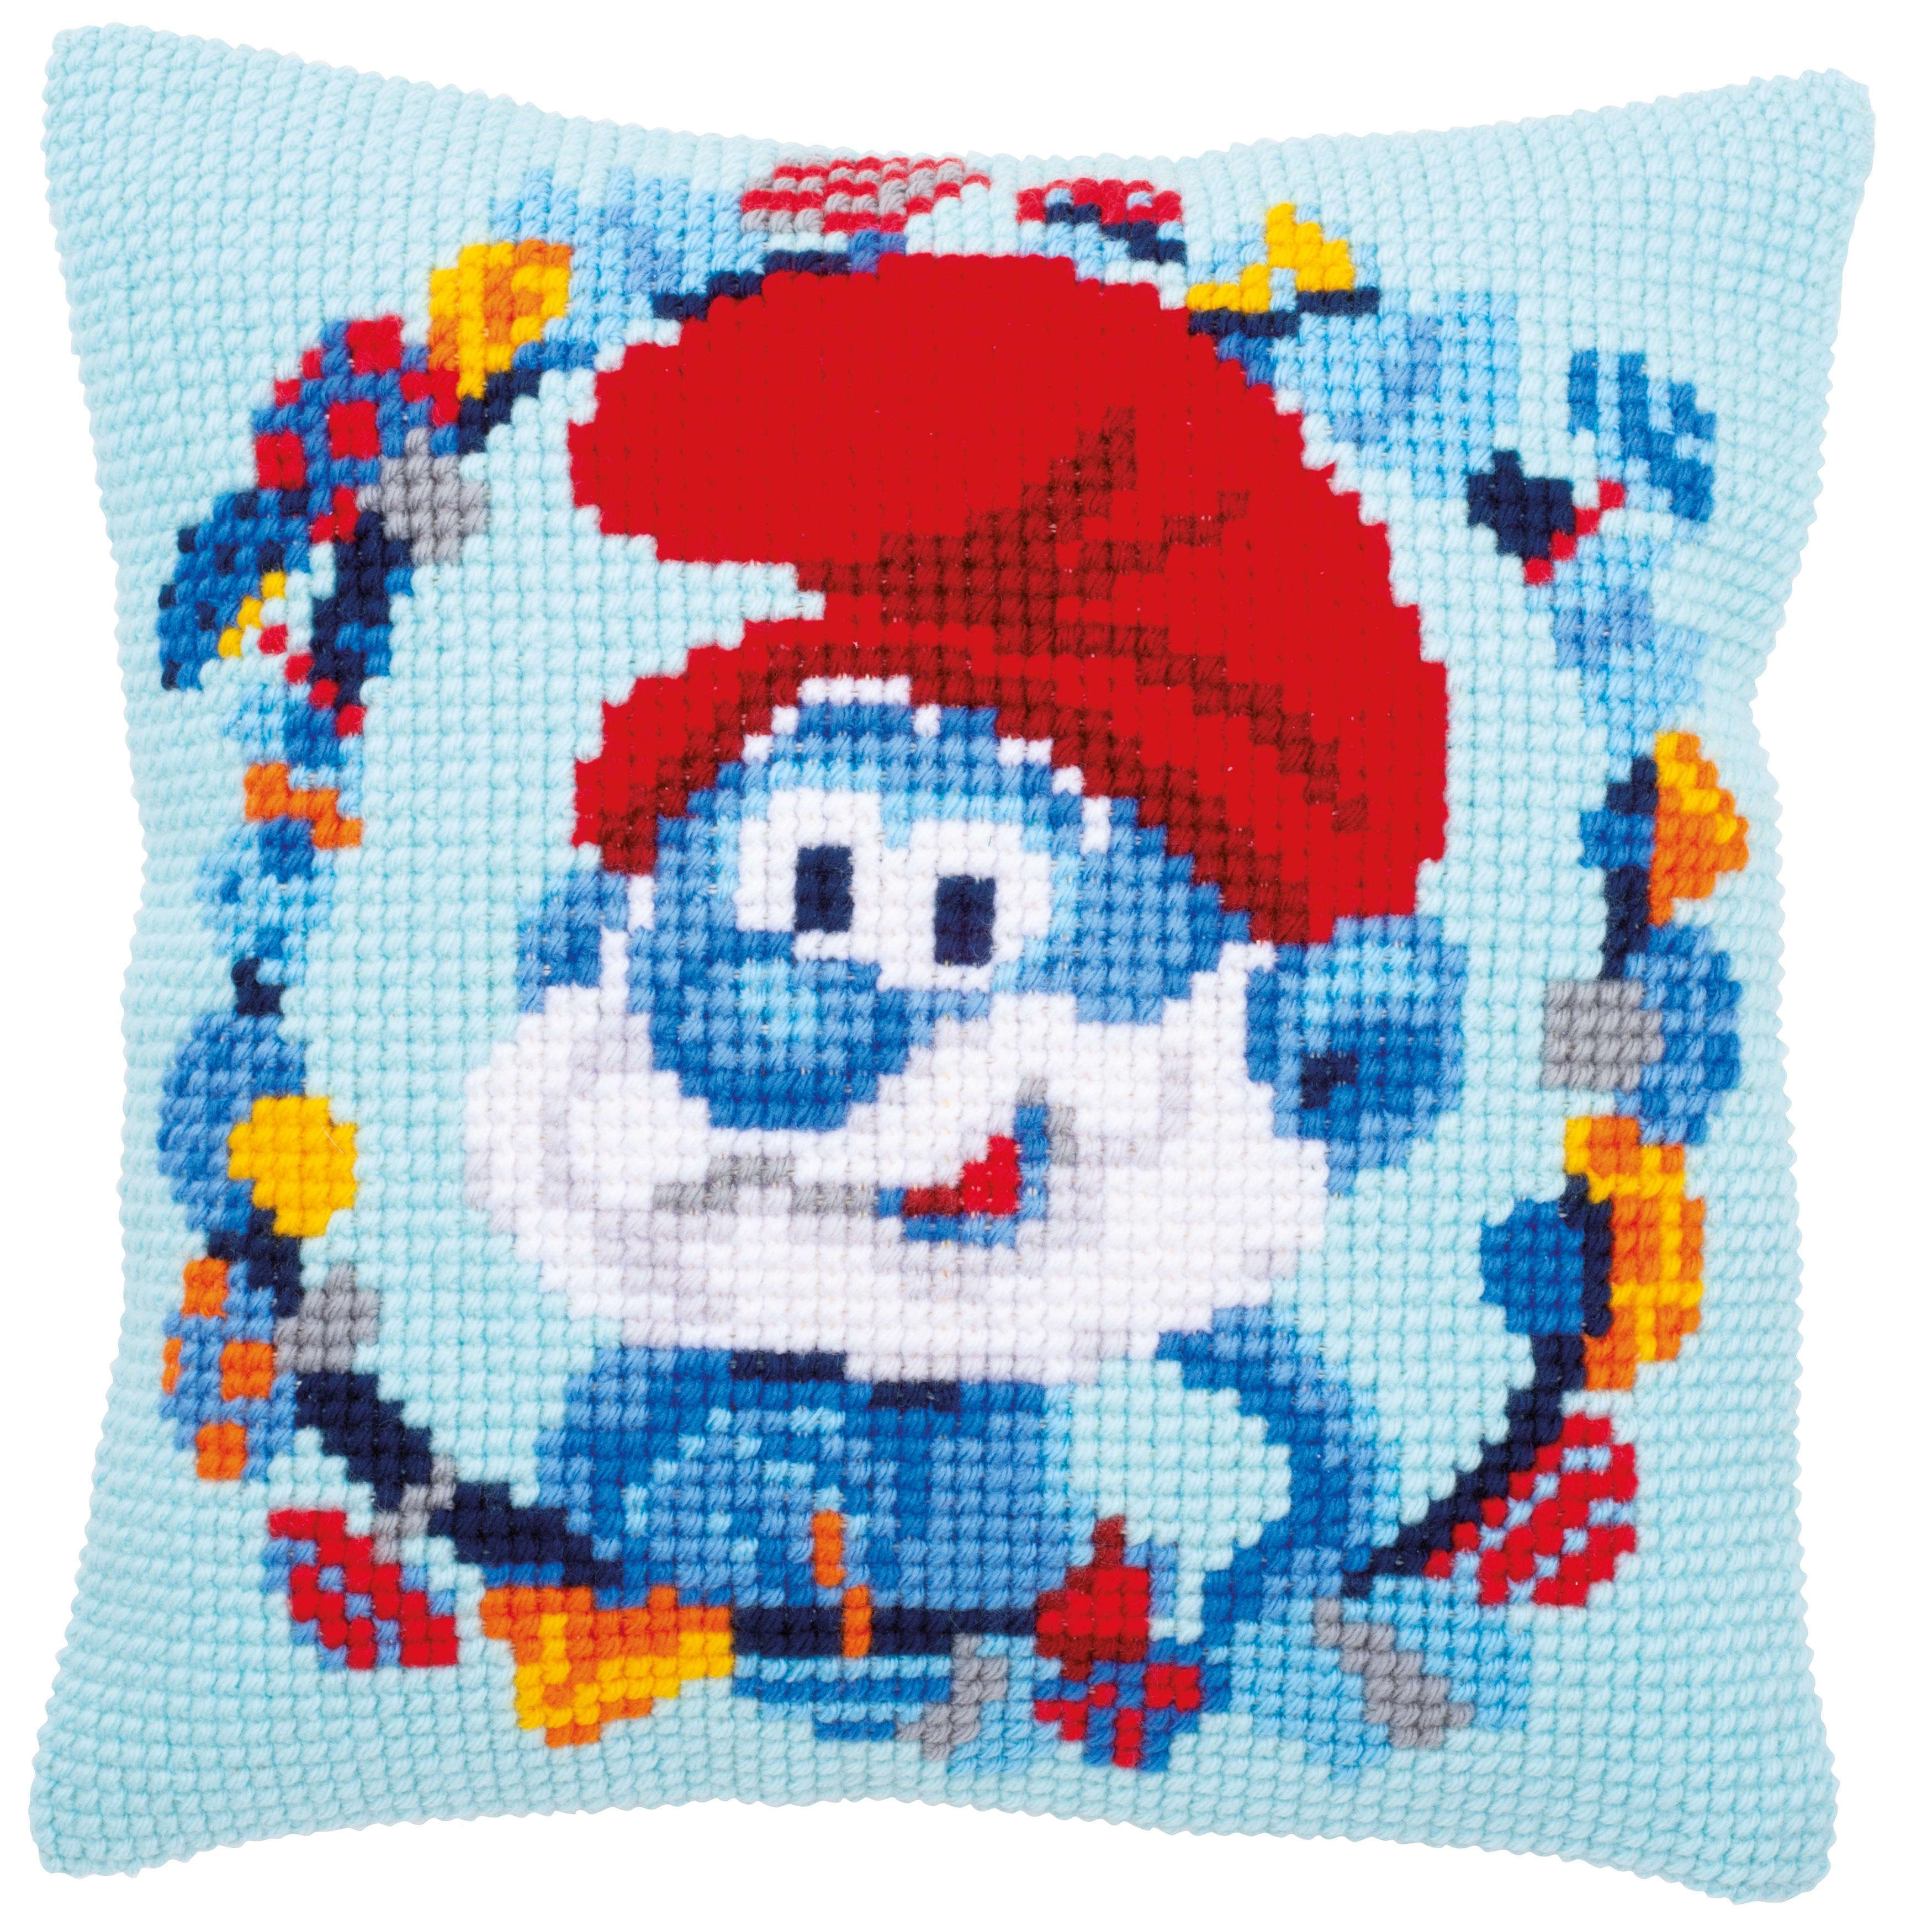 Vervaco Needlepoint Cushion Top Kit 16X16-The Smurfs Papa